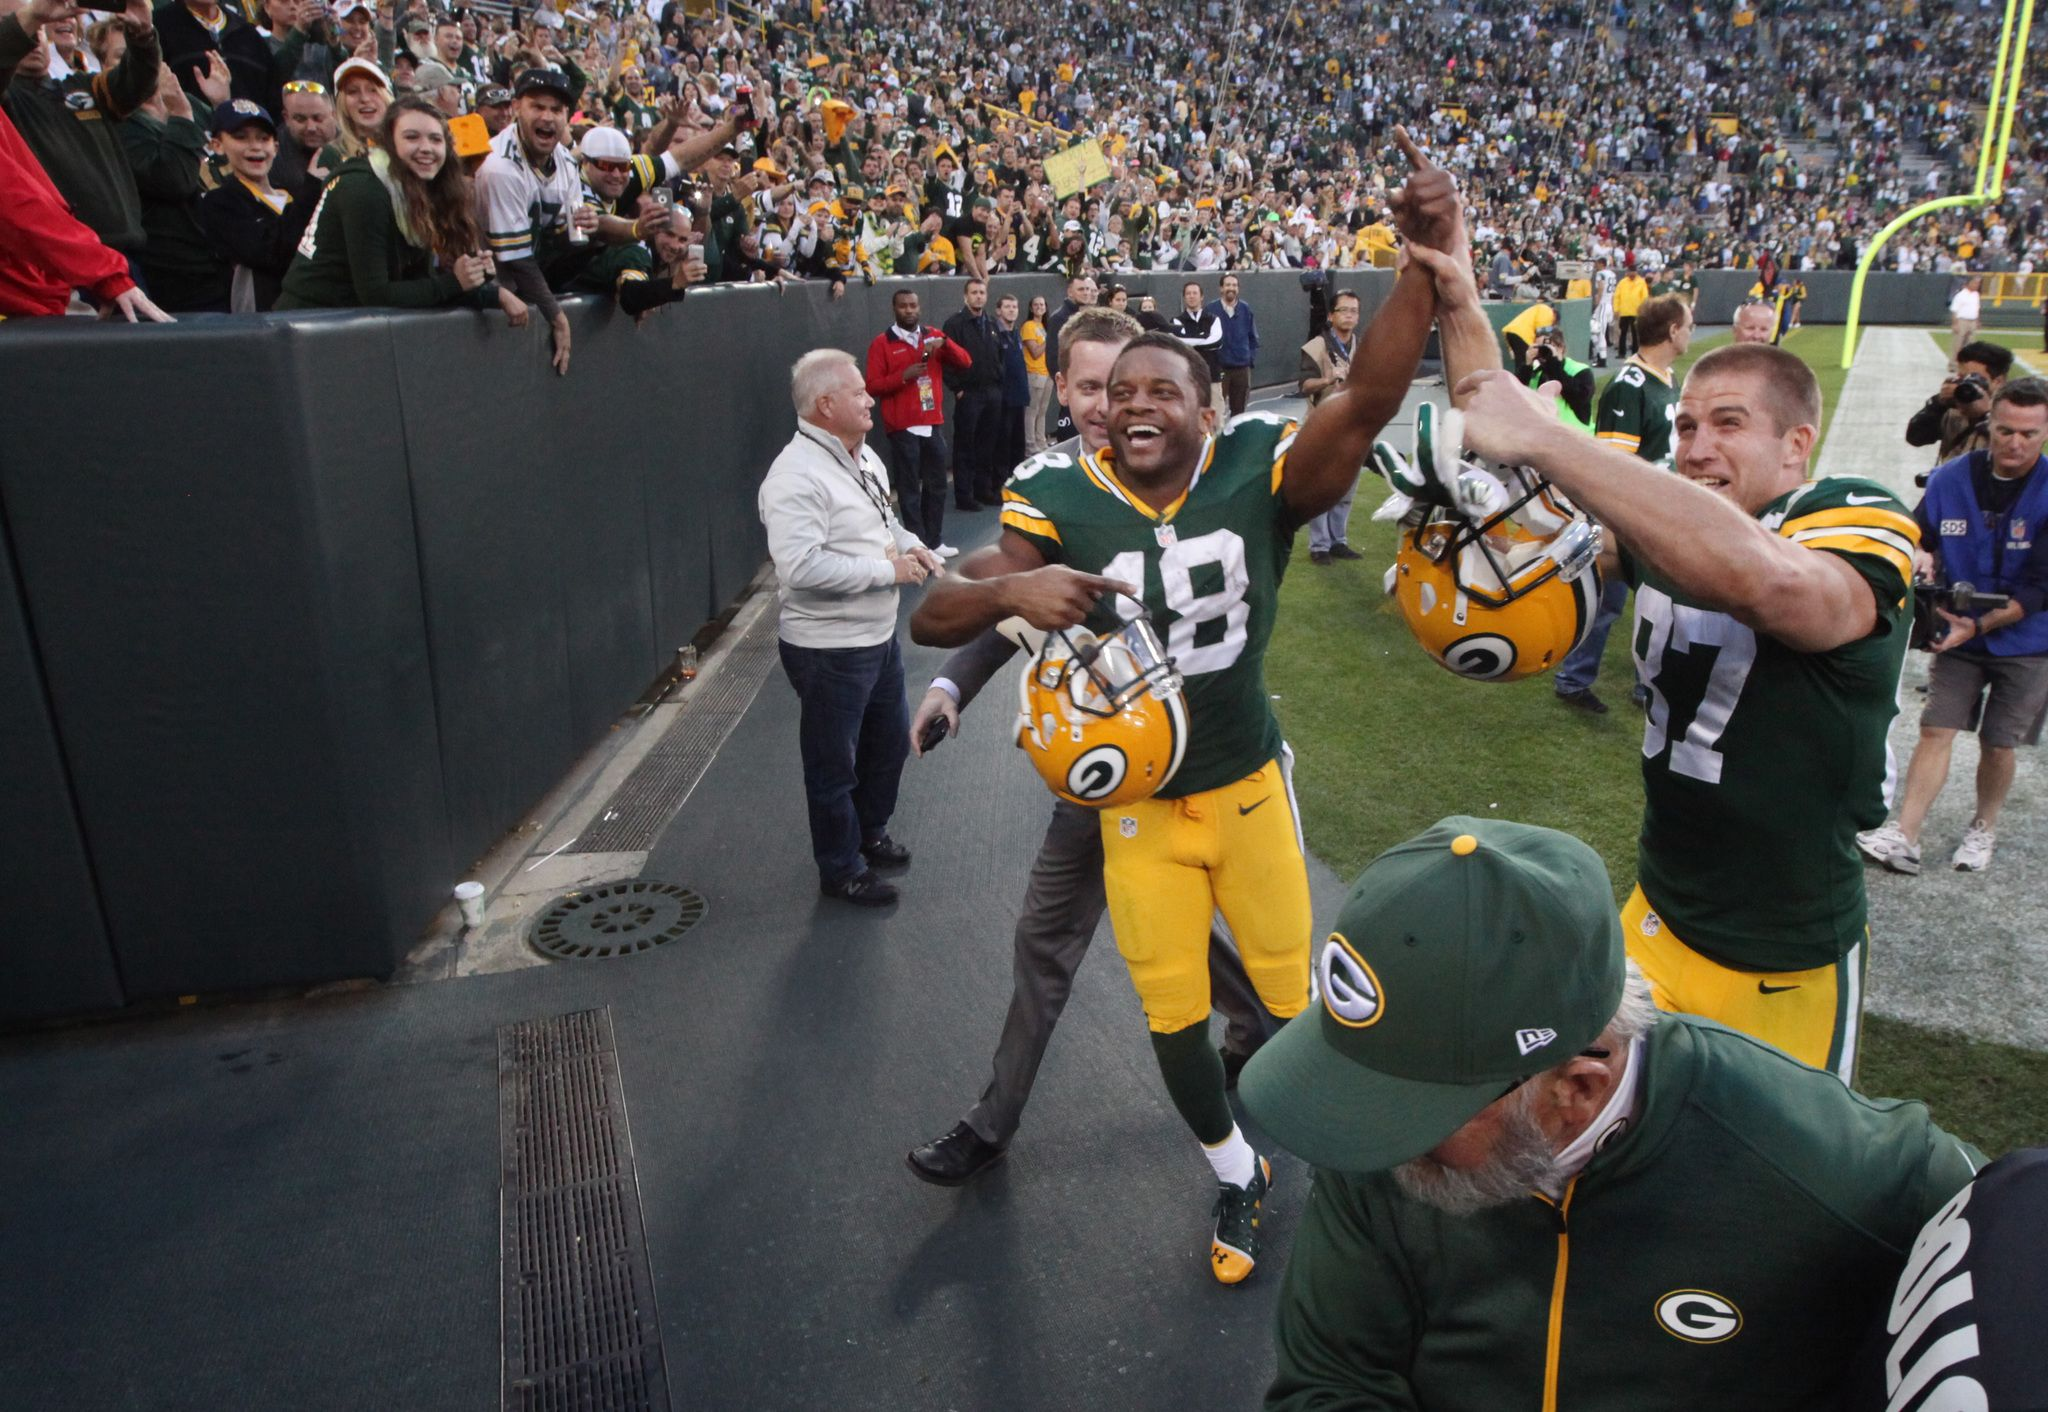 Packers 31 Jets 24 Jsonline Green Bay Packers Fans Jordy Nelson Green Bay Packers Merchandise